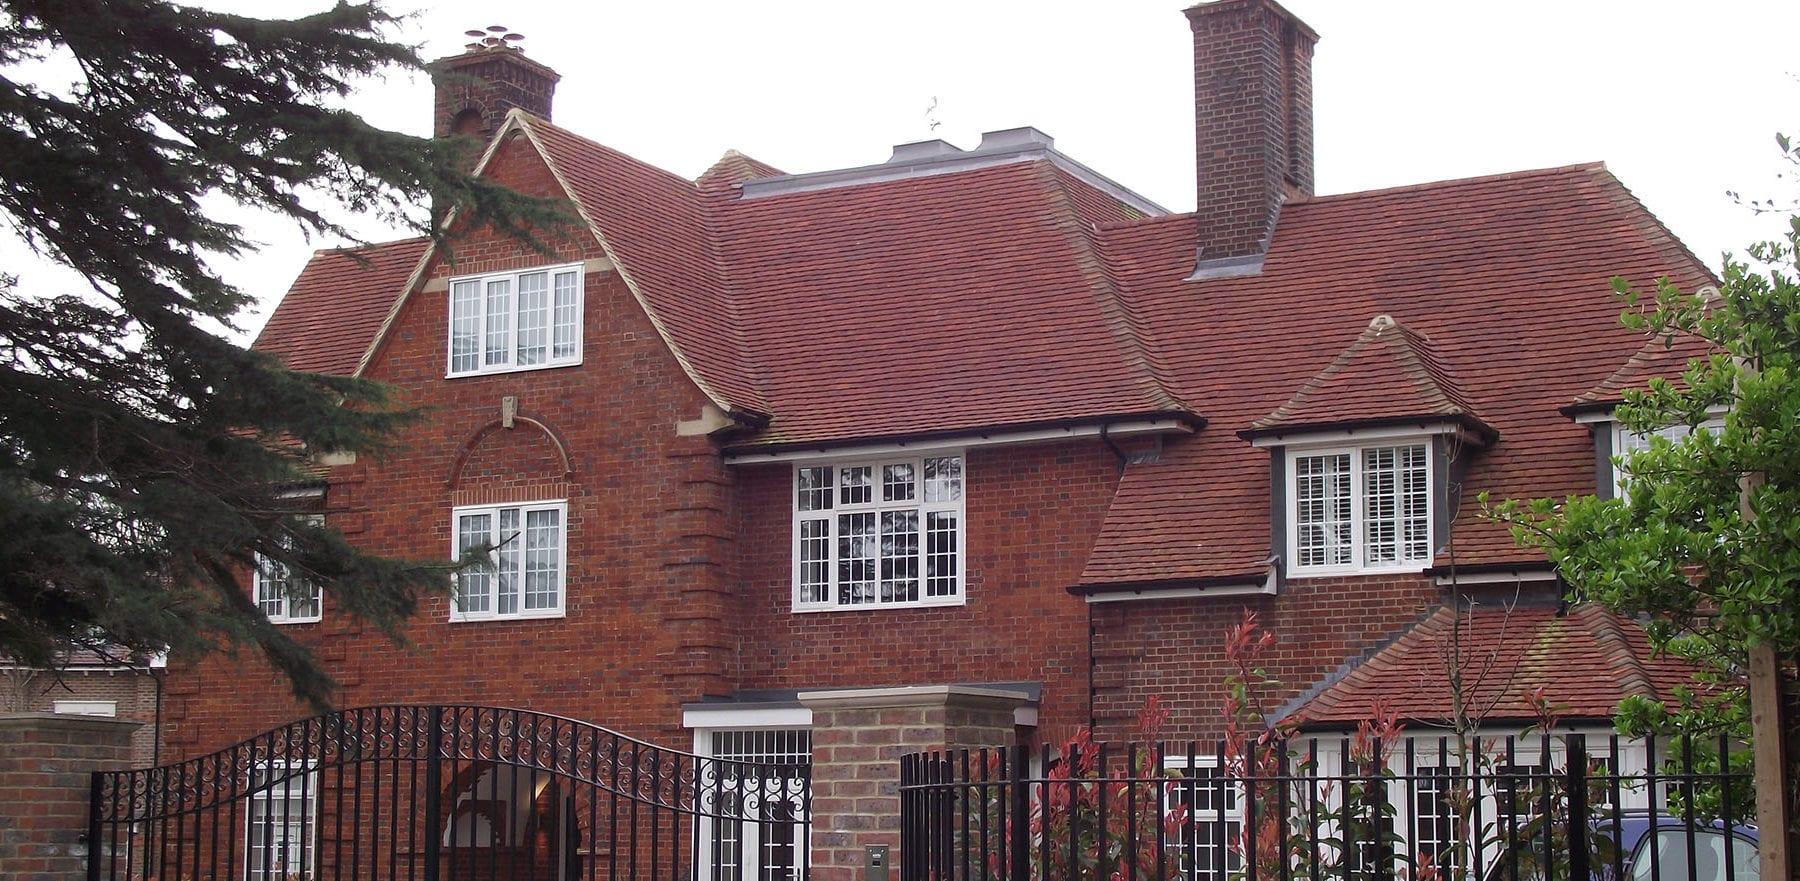 Lifestiles - Handmade Heather Clay Roof Tiles - Bickley, England 2